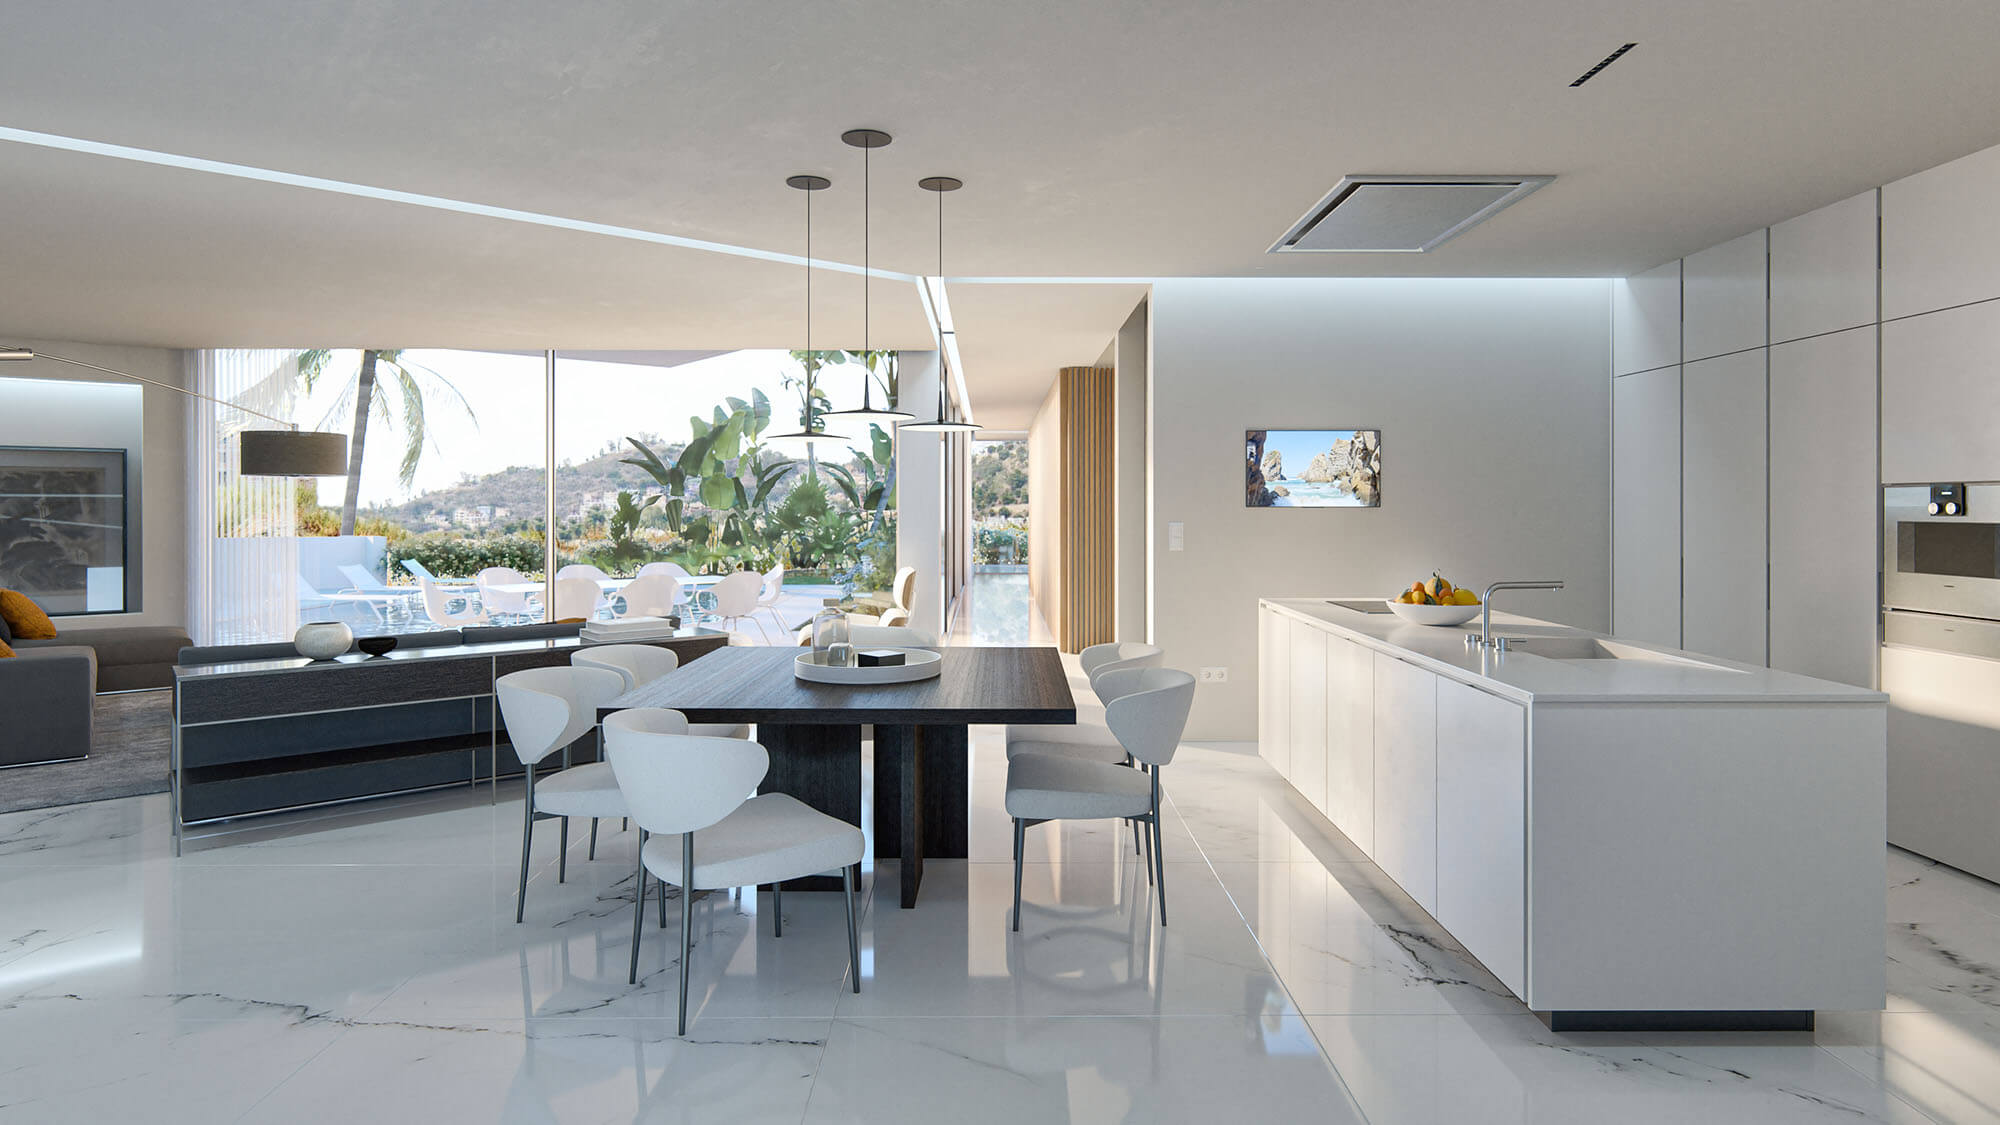 SAZ-Colinas_Del_Limonar_Cam_Kitchen_low